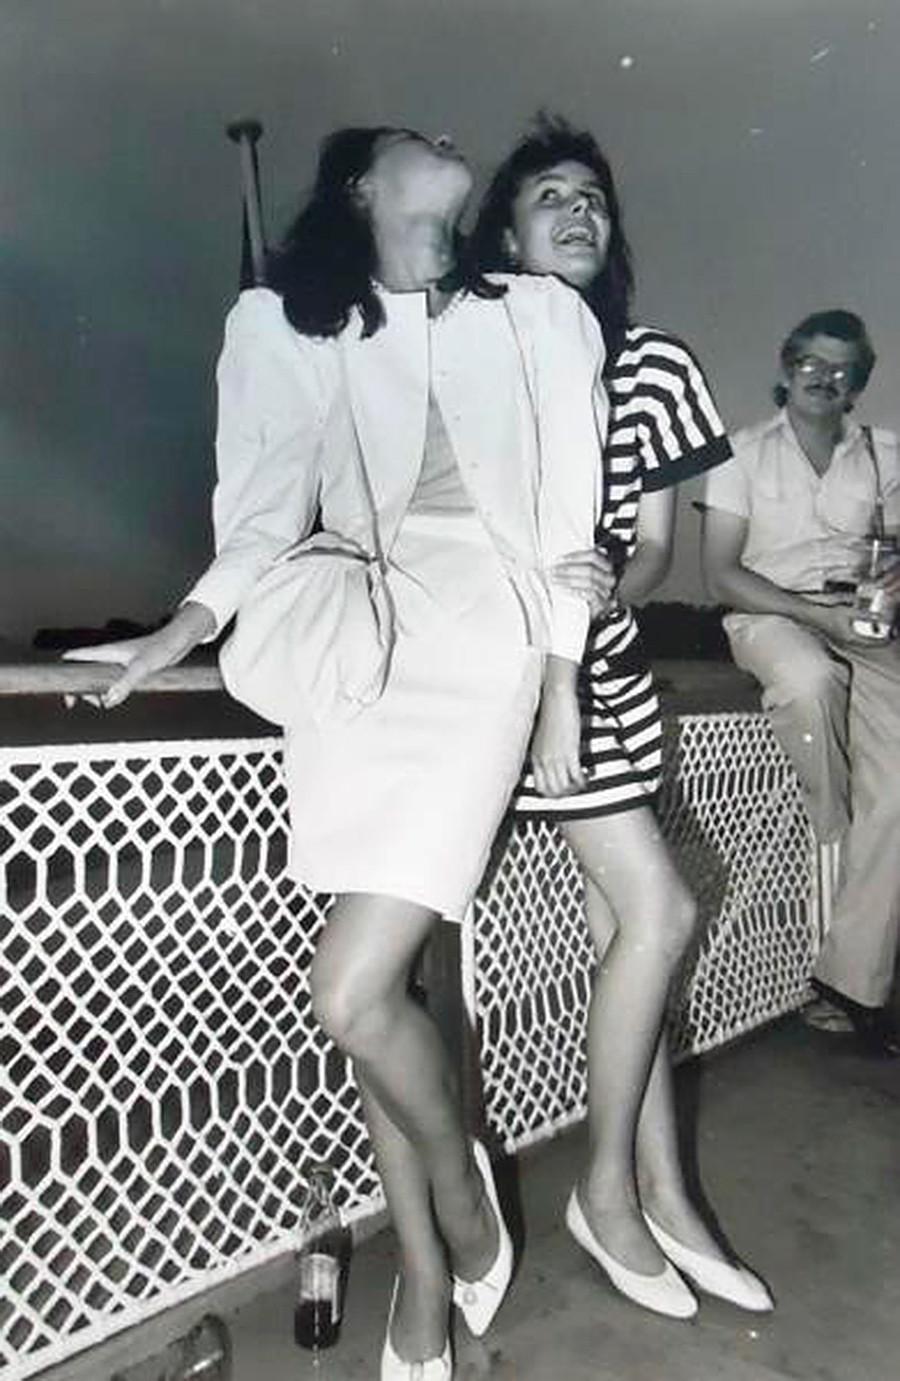 Katya Chelichkina dan Masha Kalinina, gadis-gadis ibu kota.